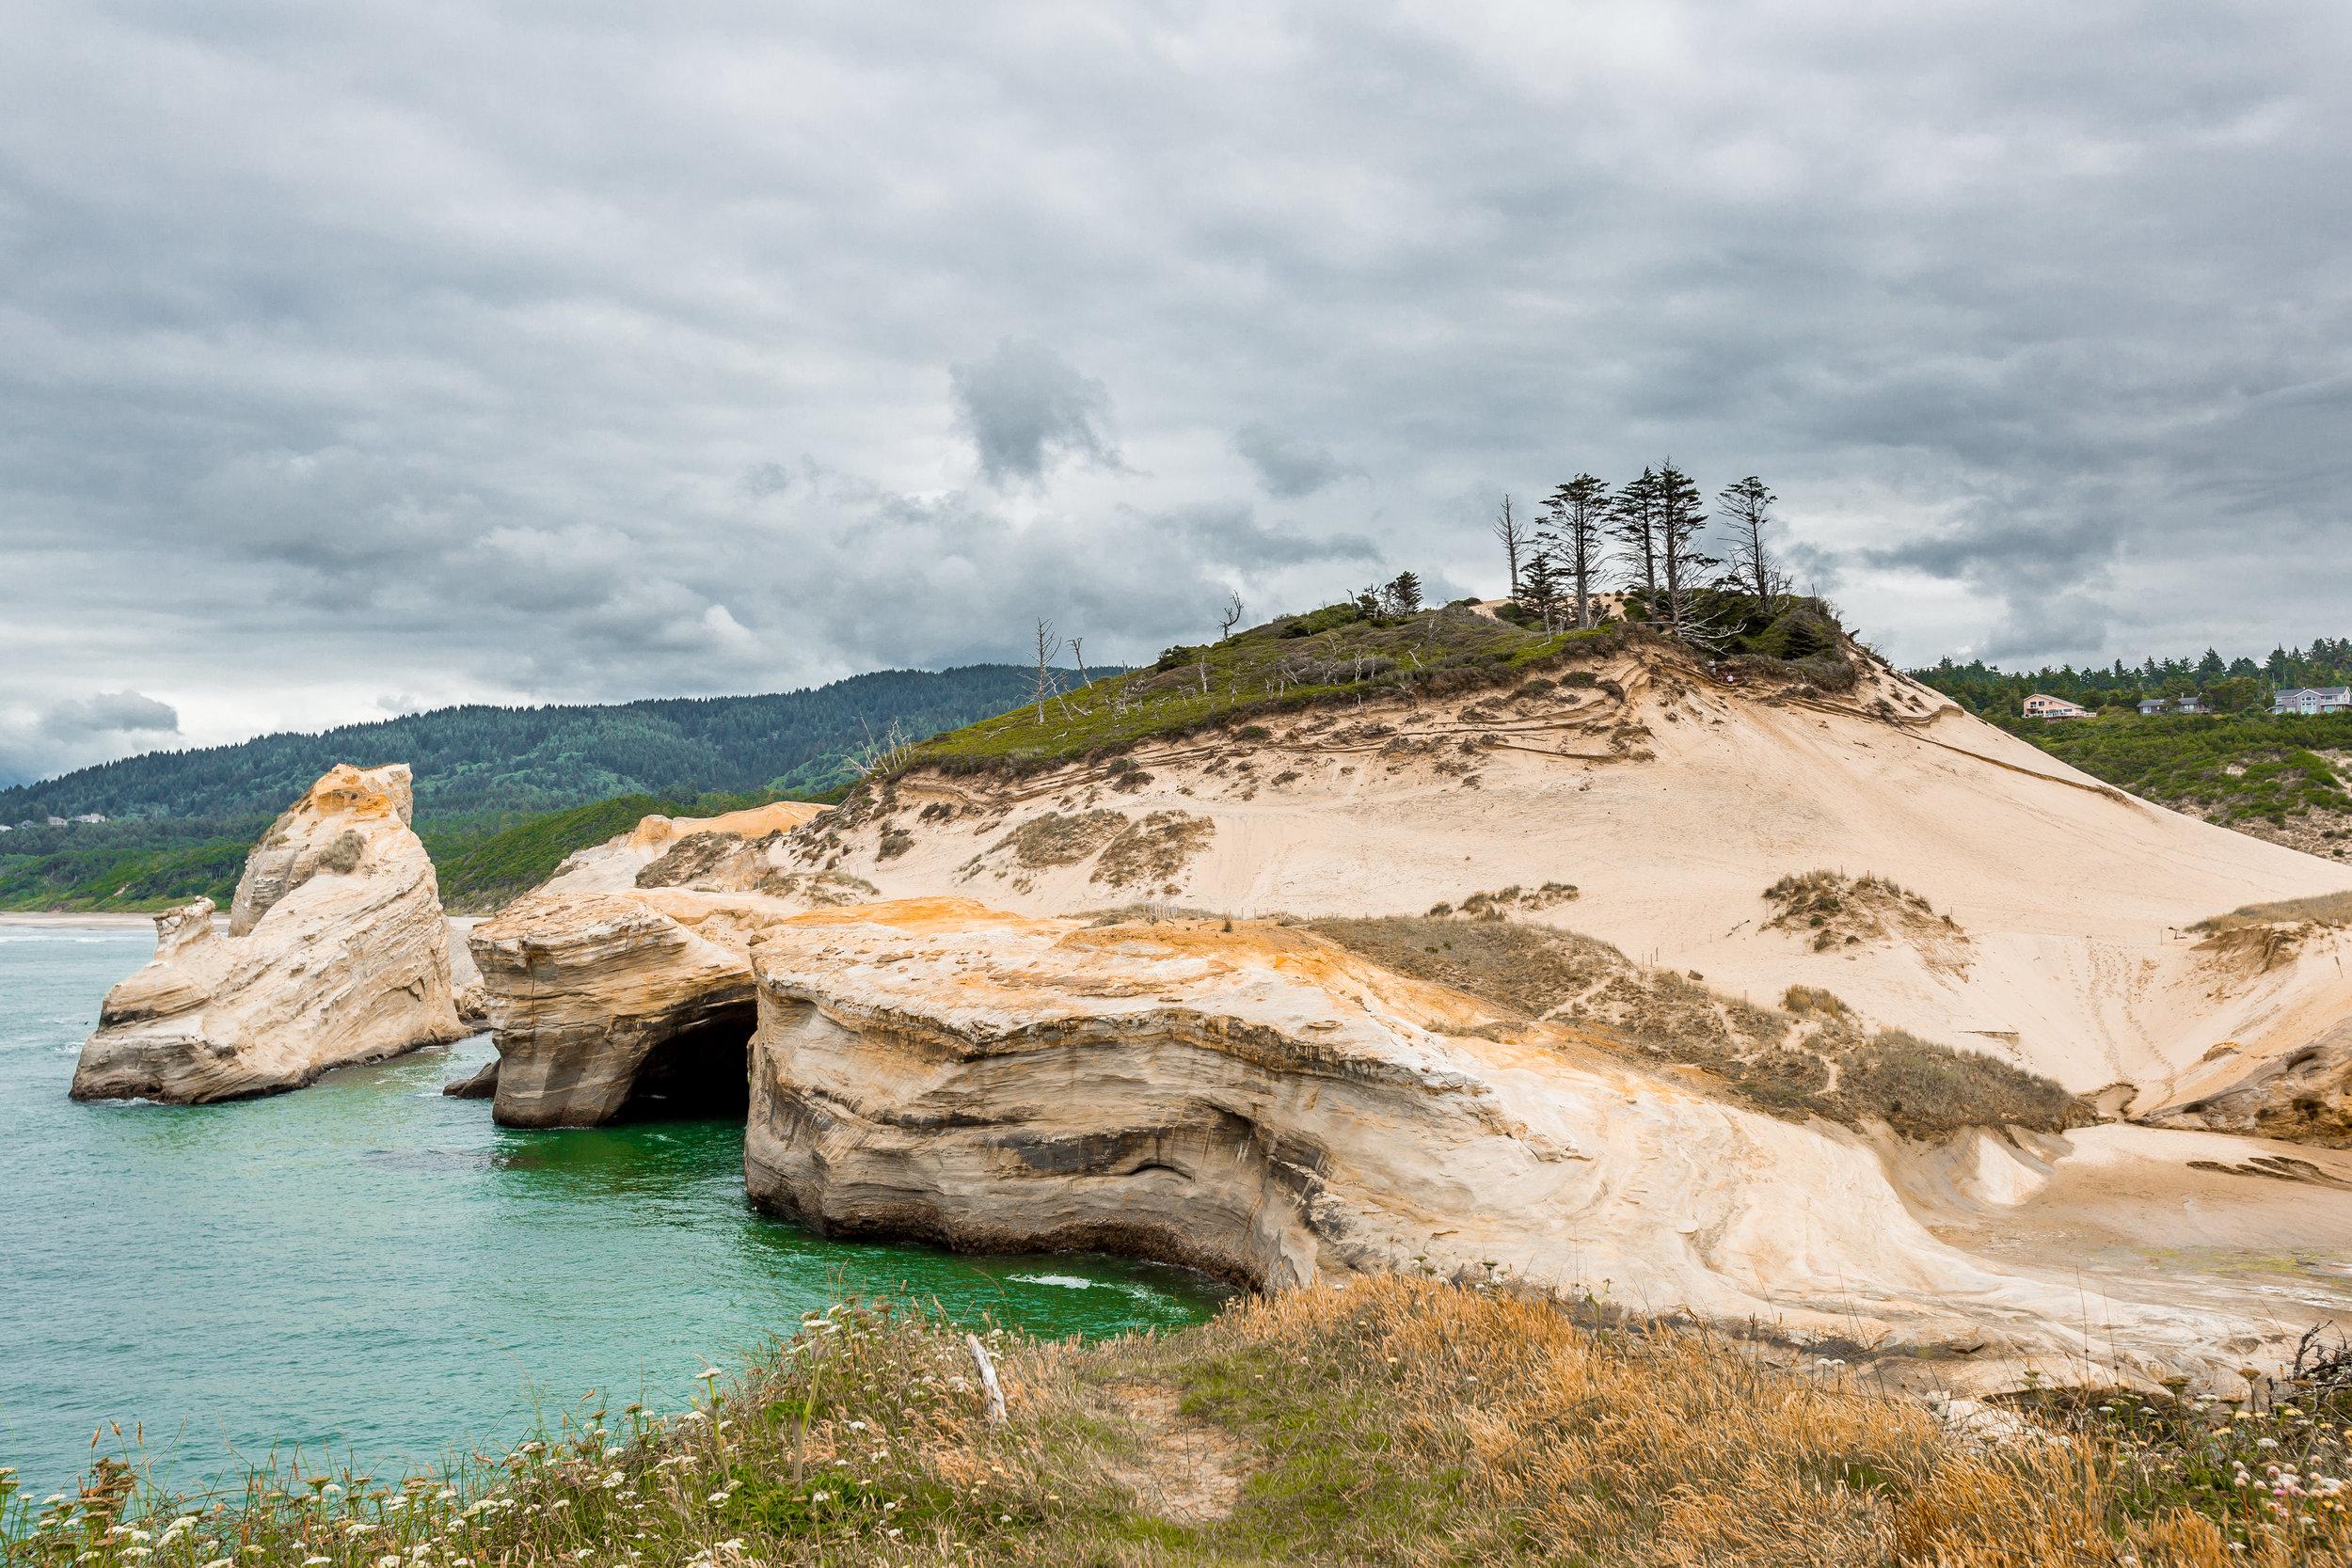 nicole-daacke-photography-oregon-coast-landscapes-elopement-photographer-wedding-photography-adventure-lifestyle-roadtrip-along-oregon-coast-cape-kiwanda-oceanside-beach-cannon-beach-oregon-pnw-6.jpg